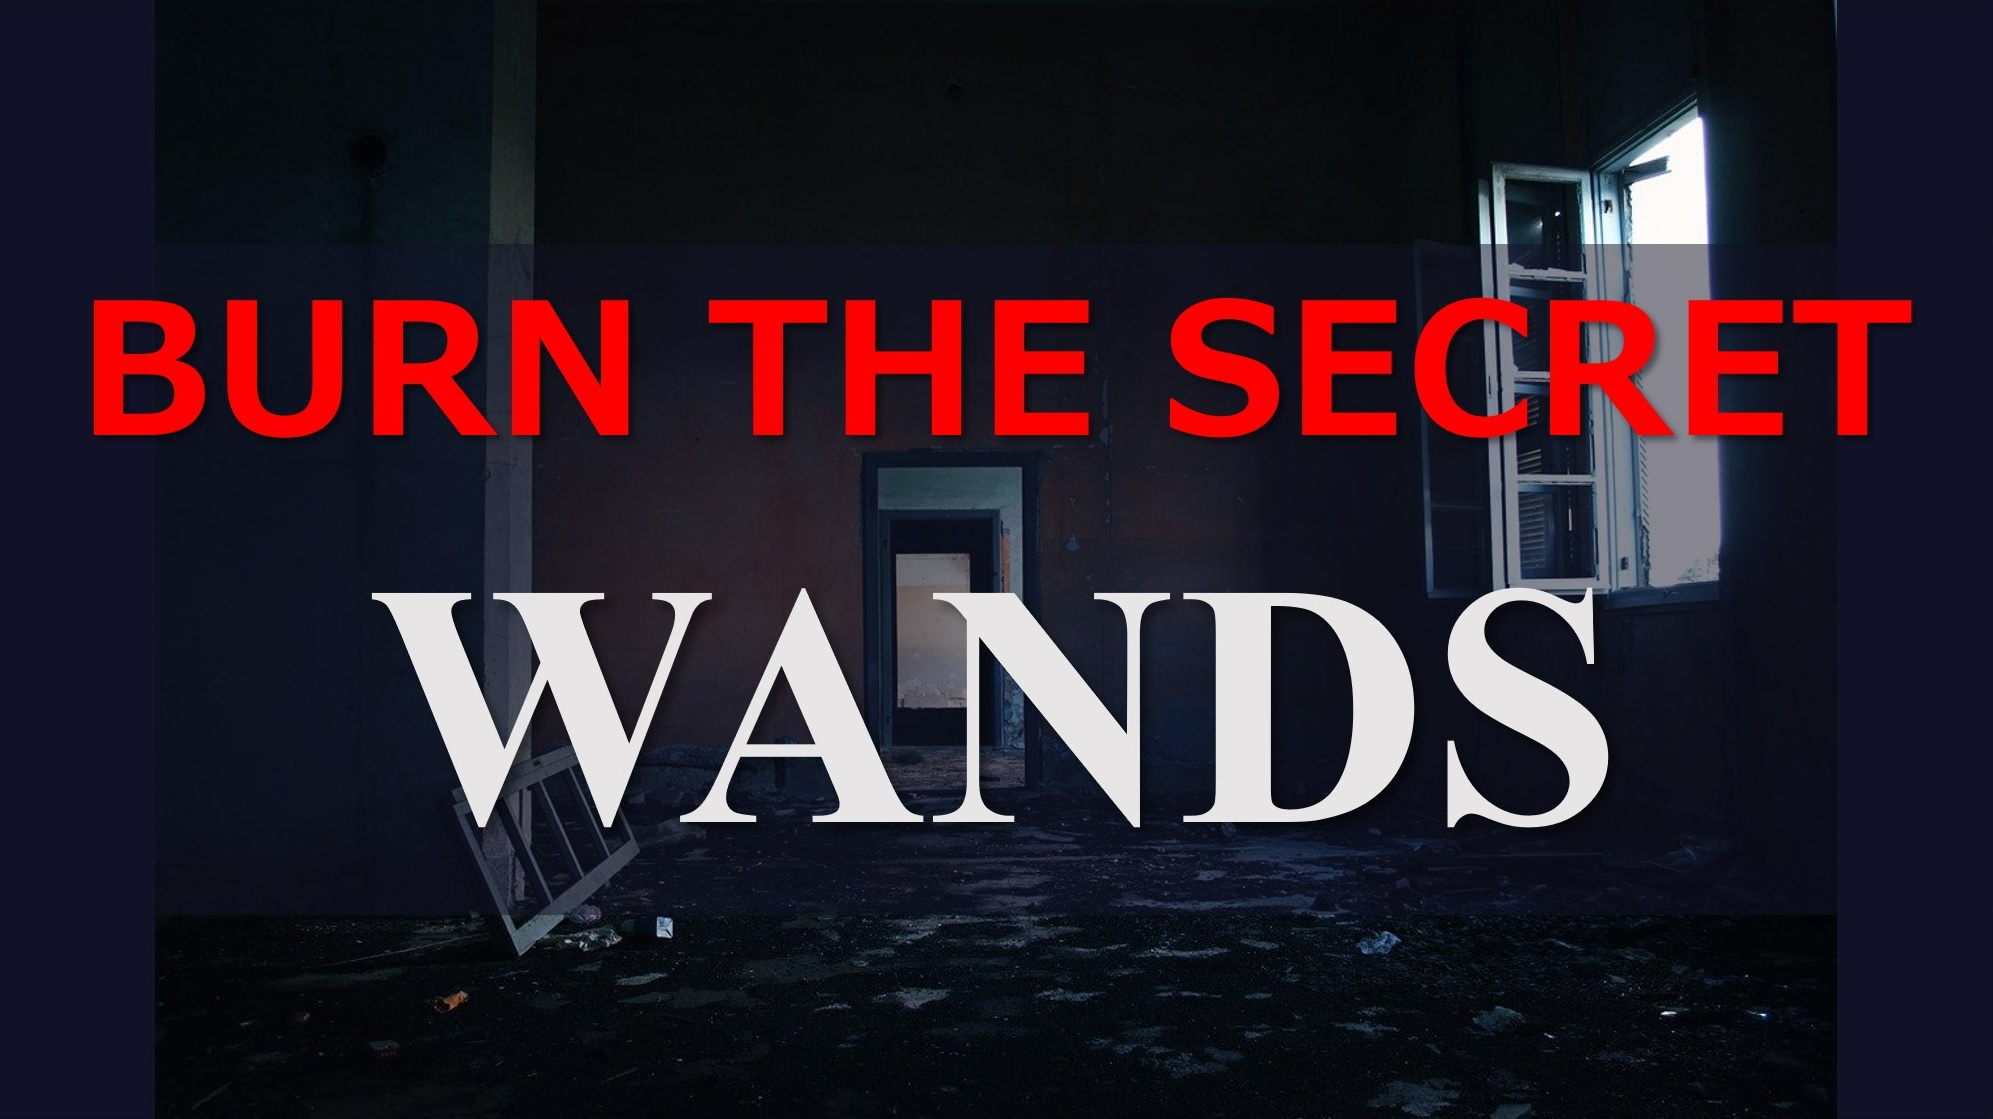 BURN THE SECRET WANDS